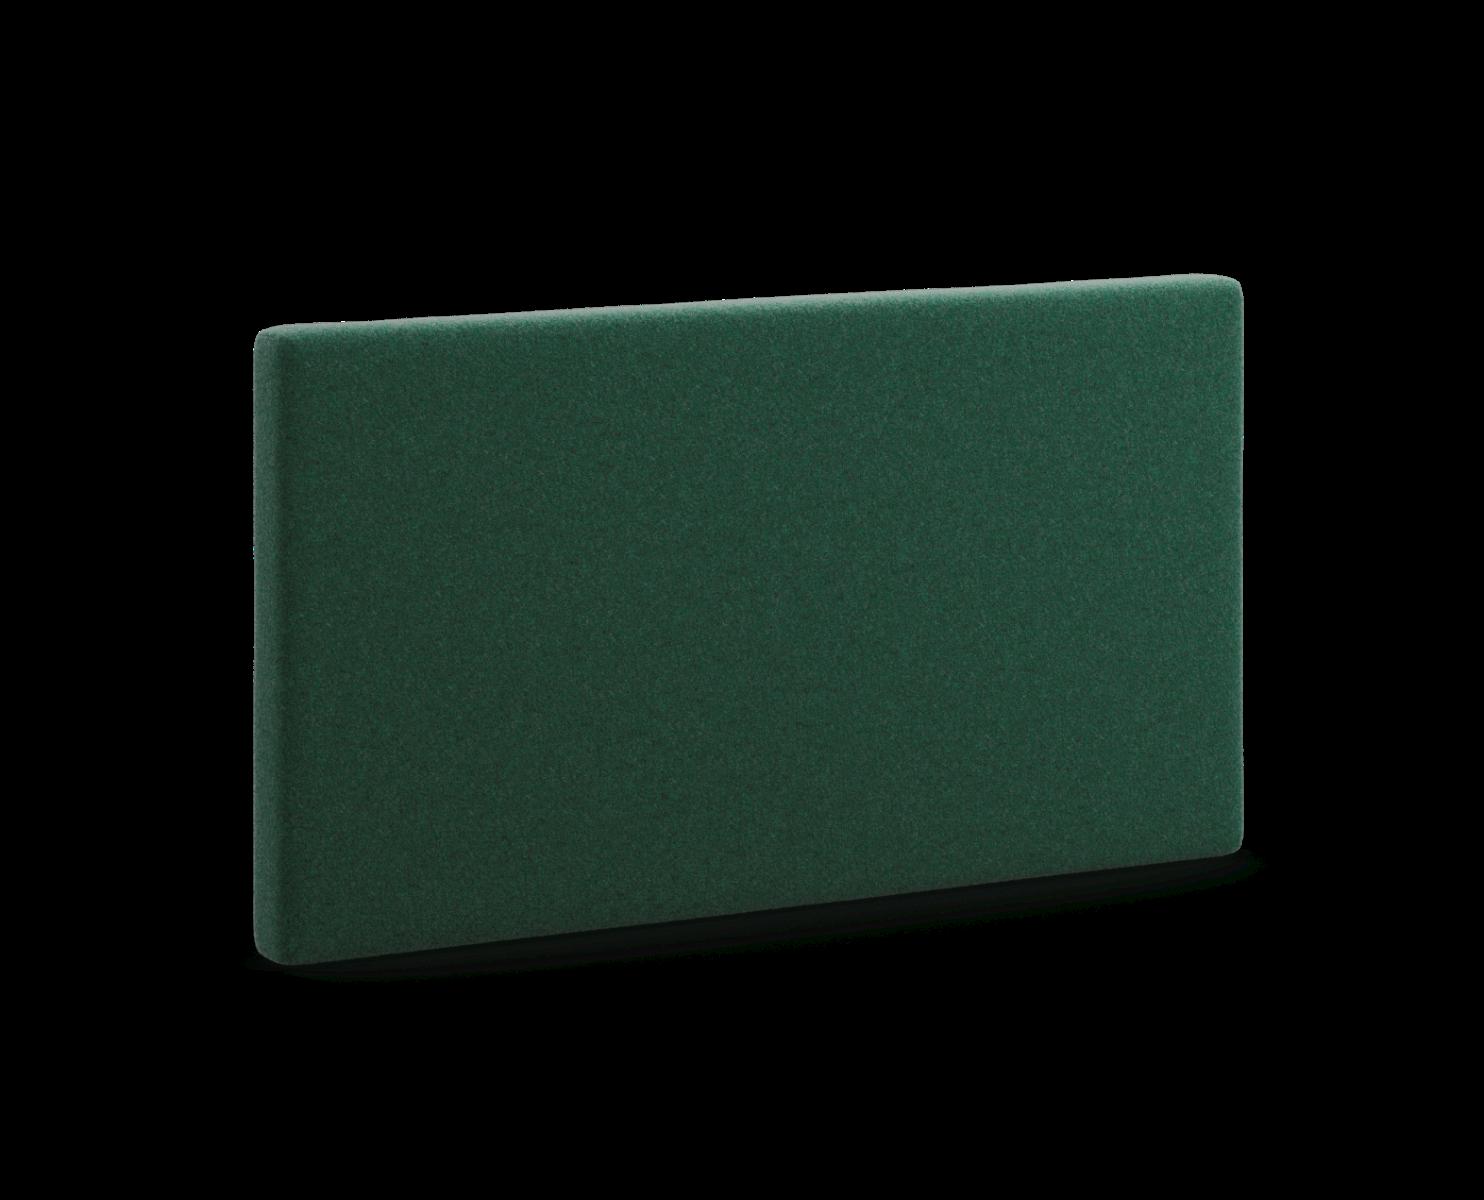 Køb Ovia Væghængt - 210x108x8 Grønn